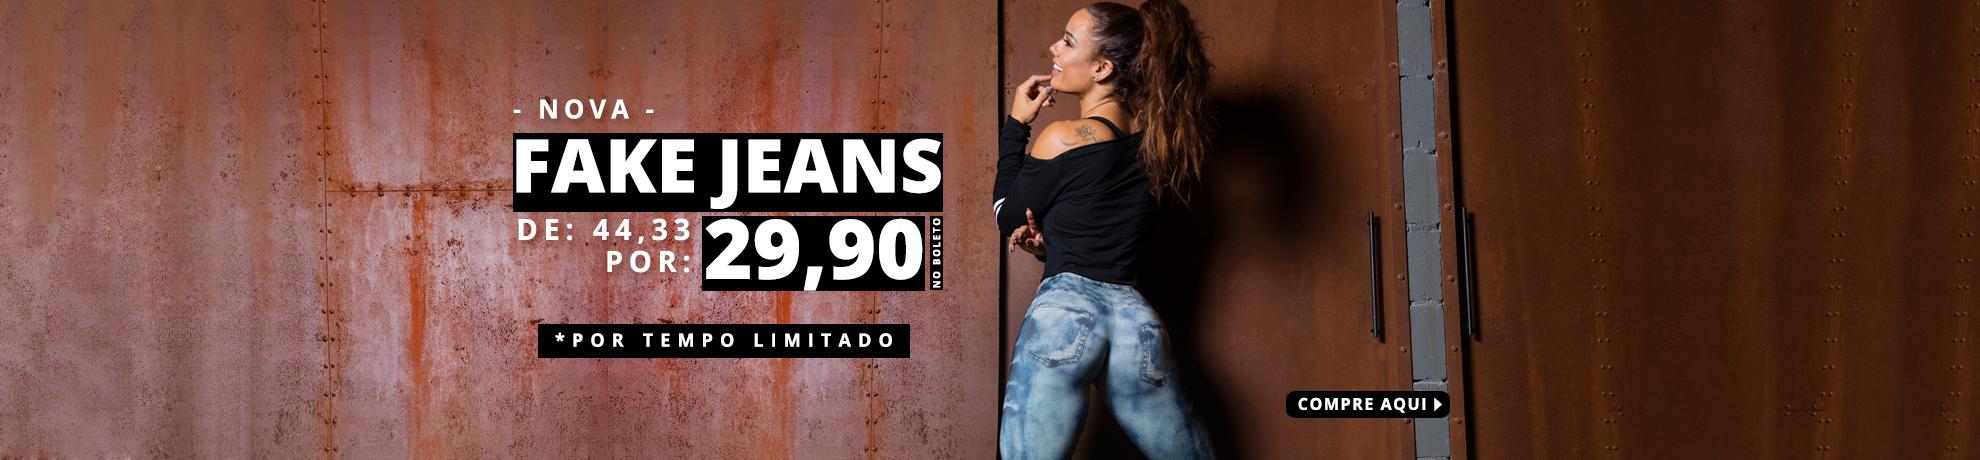 banner nova fake jeans